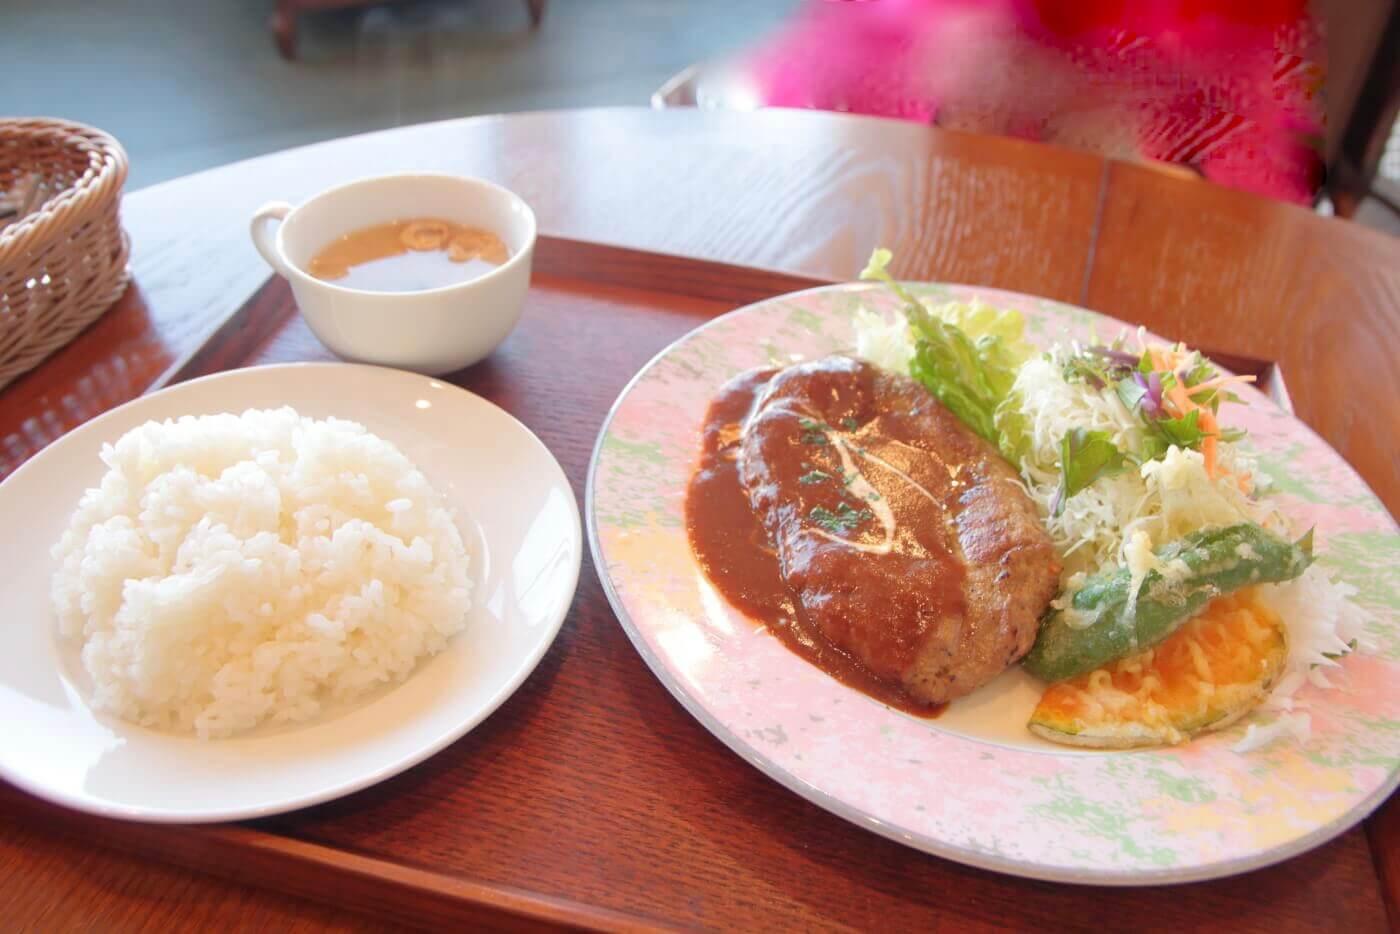 Real食堂 西山珈琲館 合い挽き肉のハンバーグセット220g